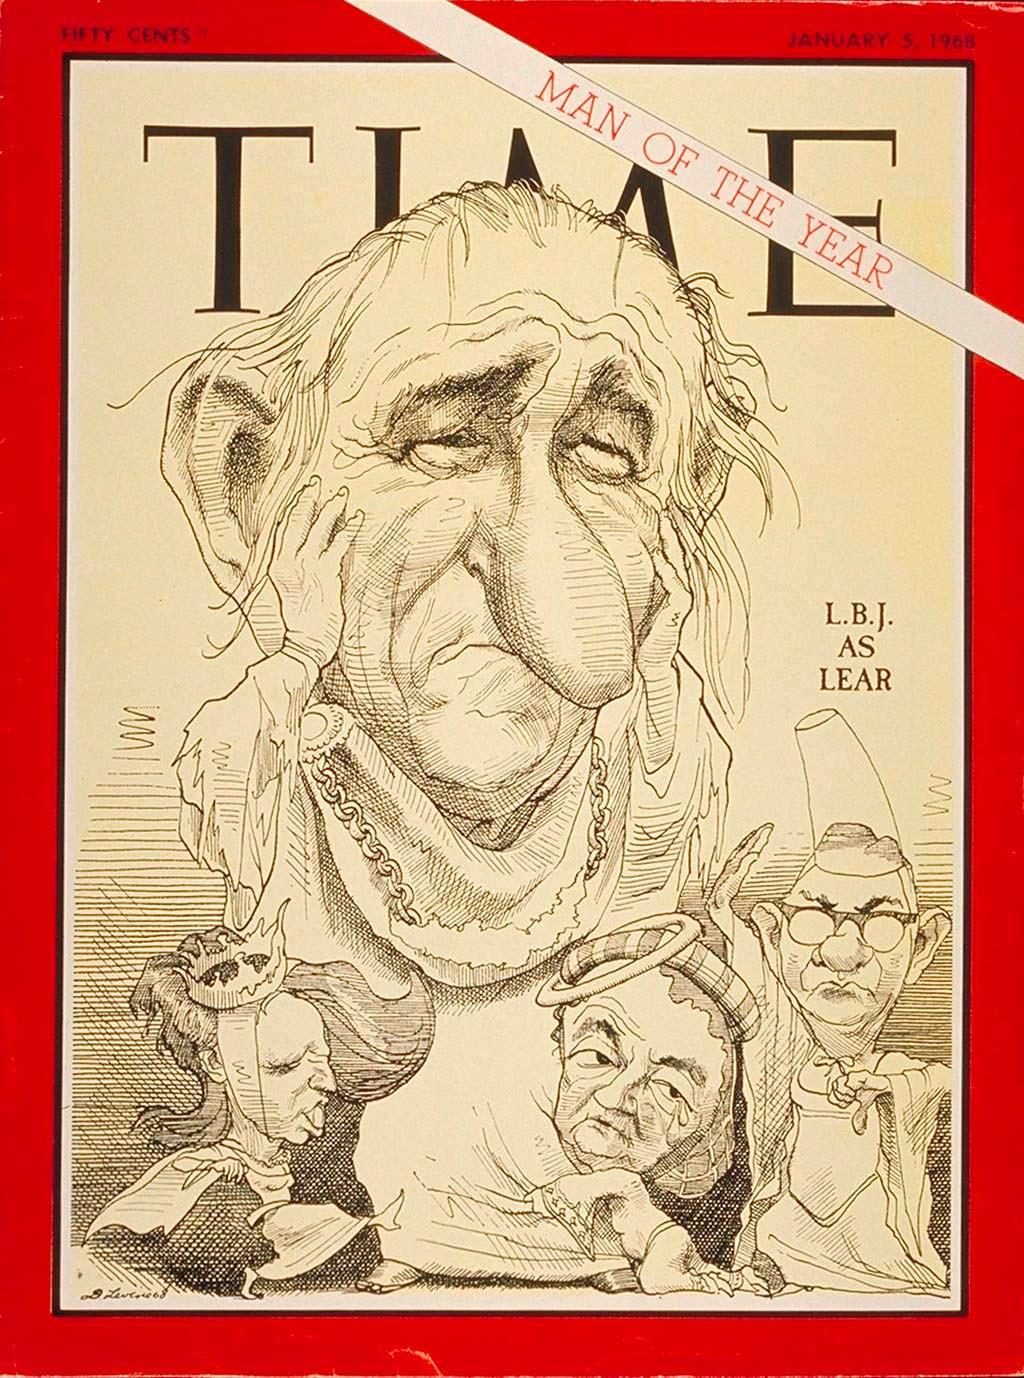 1967 год. Президент США Линдон Джонсон на обложке Time